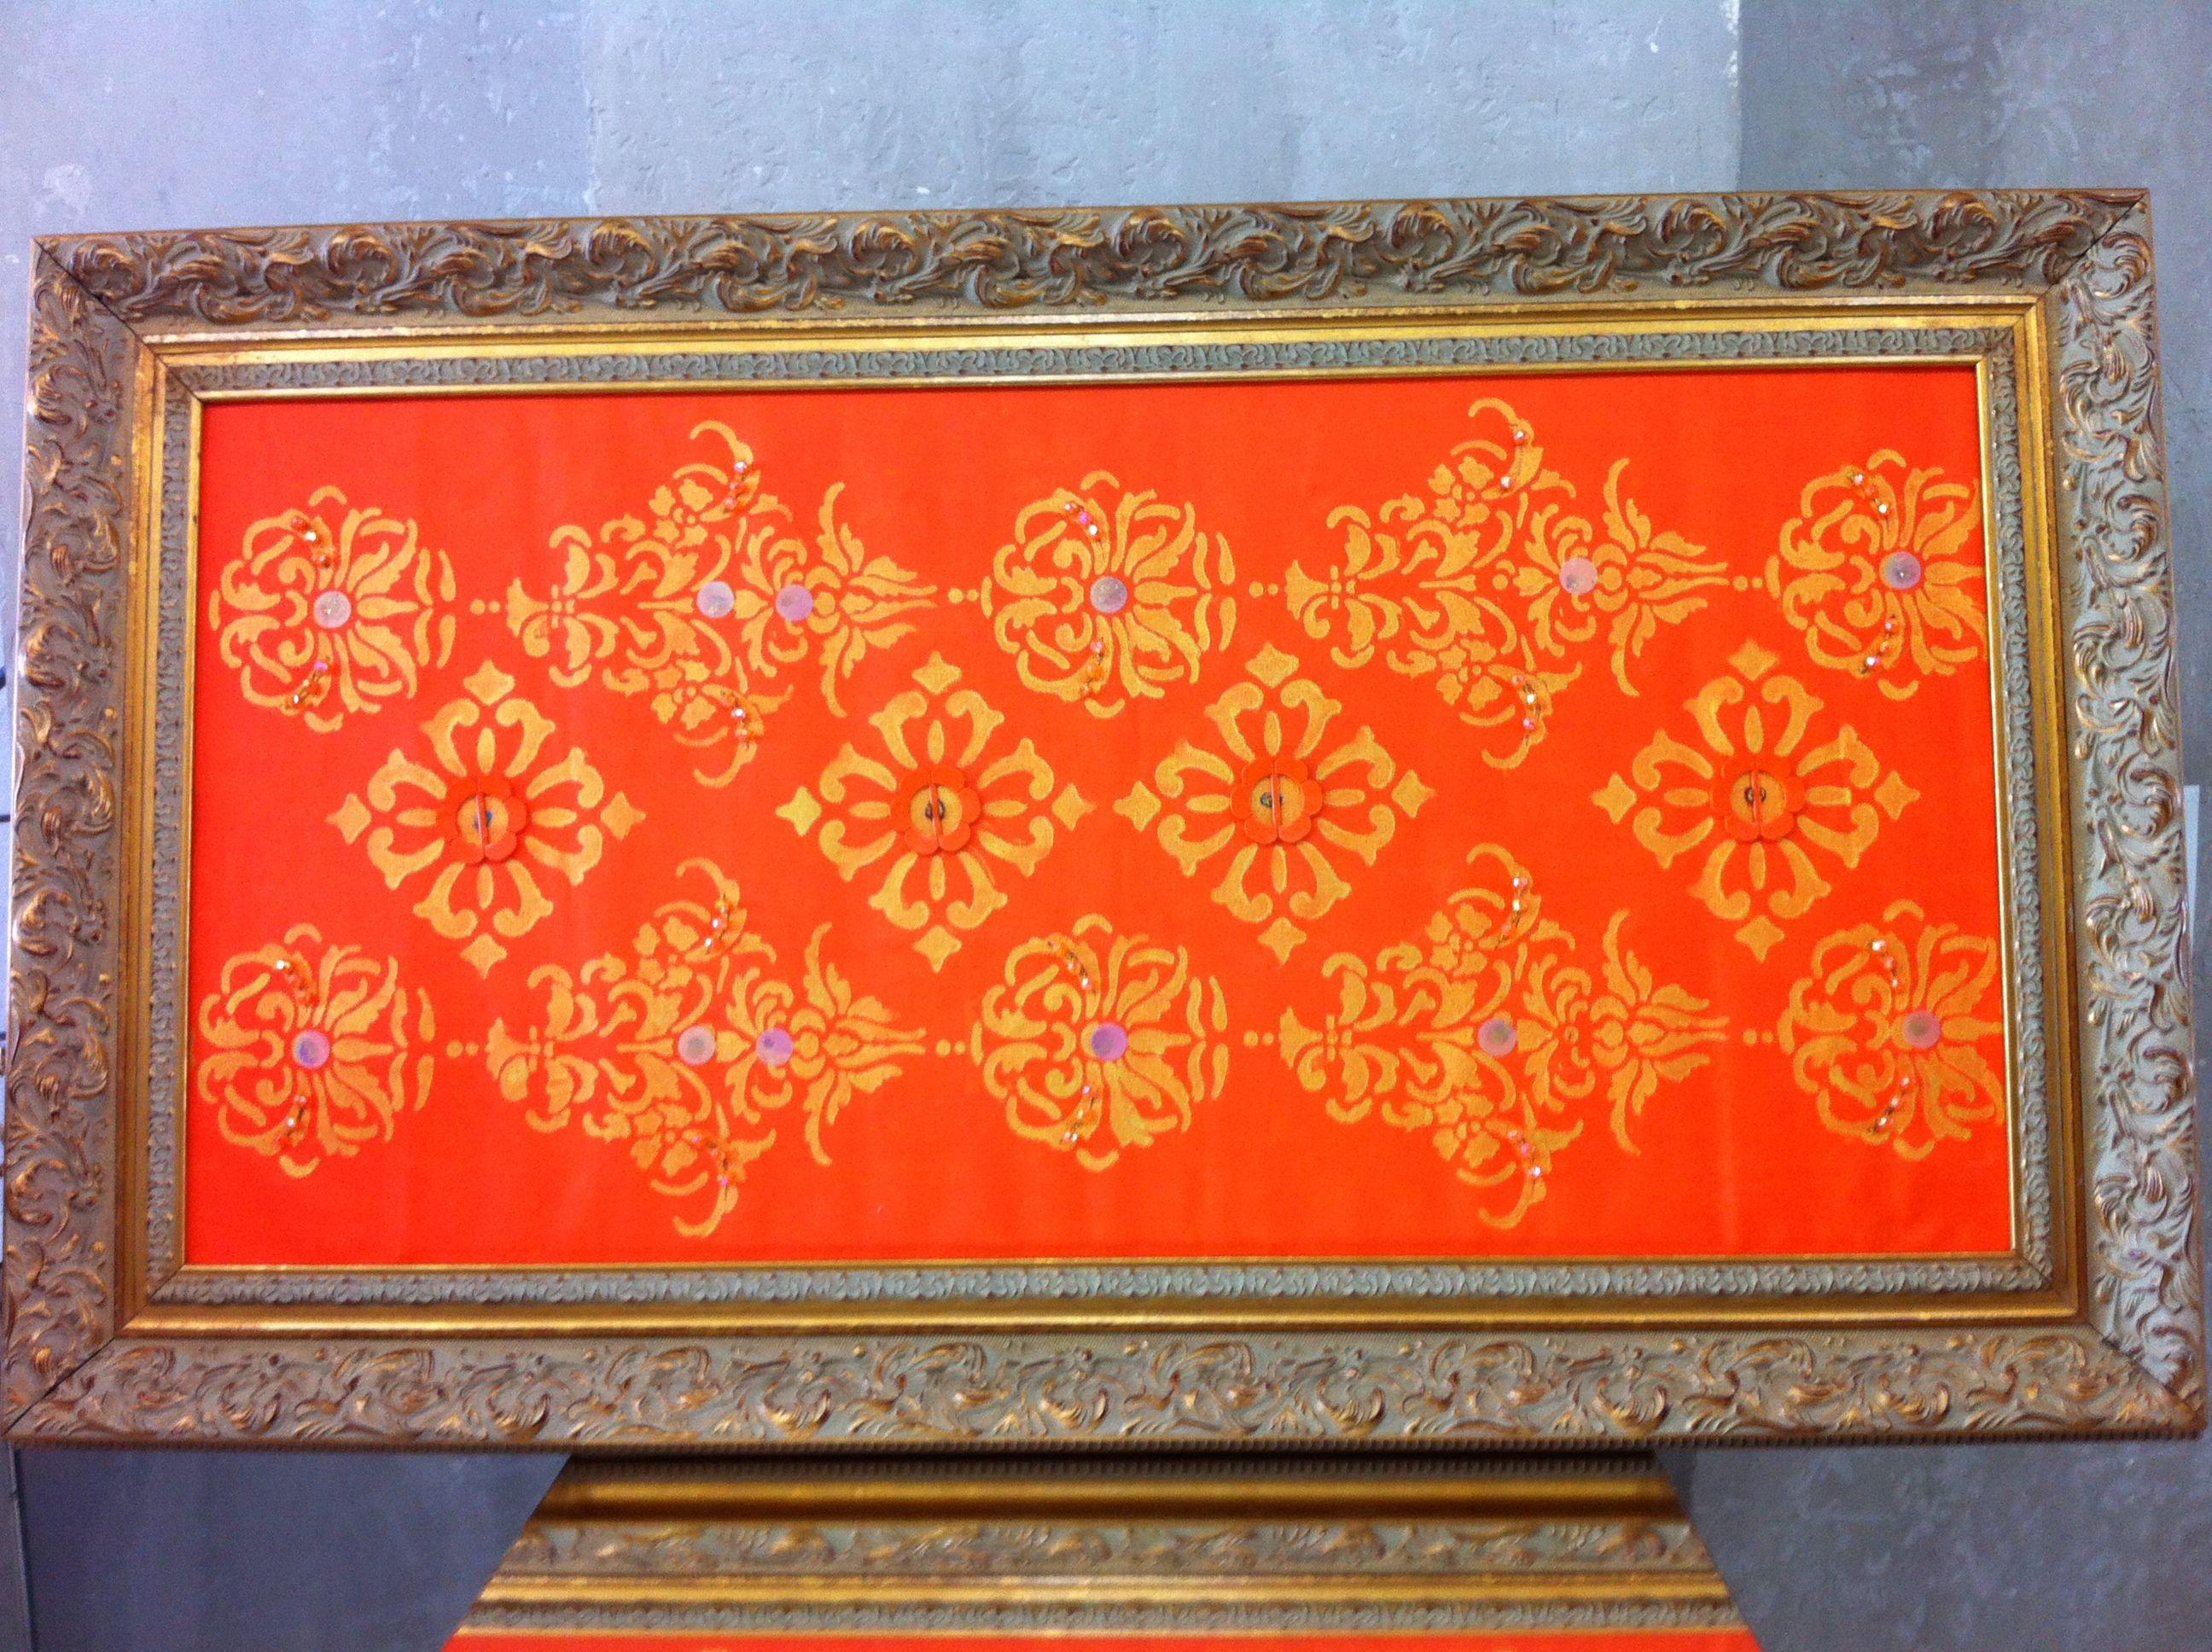 Tela Indiano Laranja em pintura acrilica e tecnica mista 2013 - 70x120 - acrylic on canvas - Melina Ollandezos